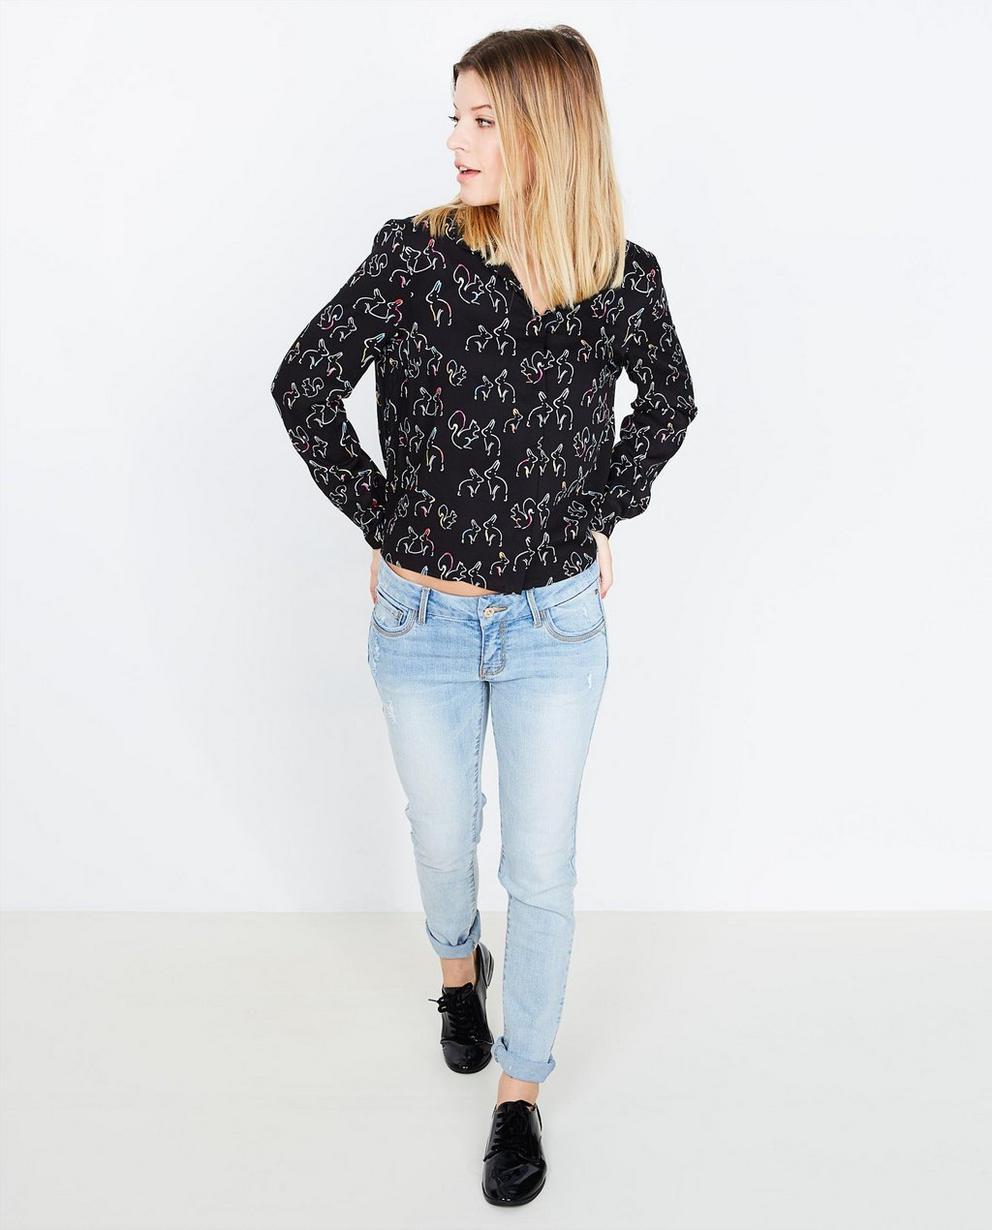 Zwart viscose blouse - met konijnenprint - Groggy